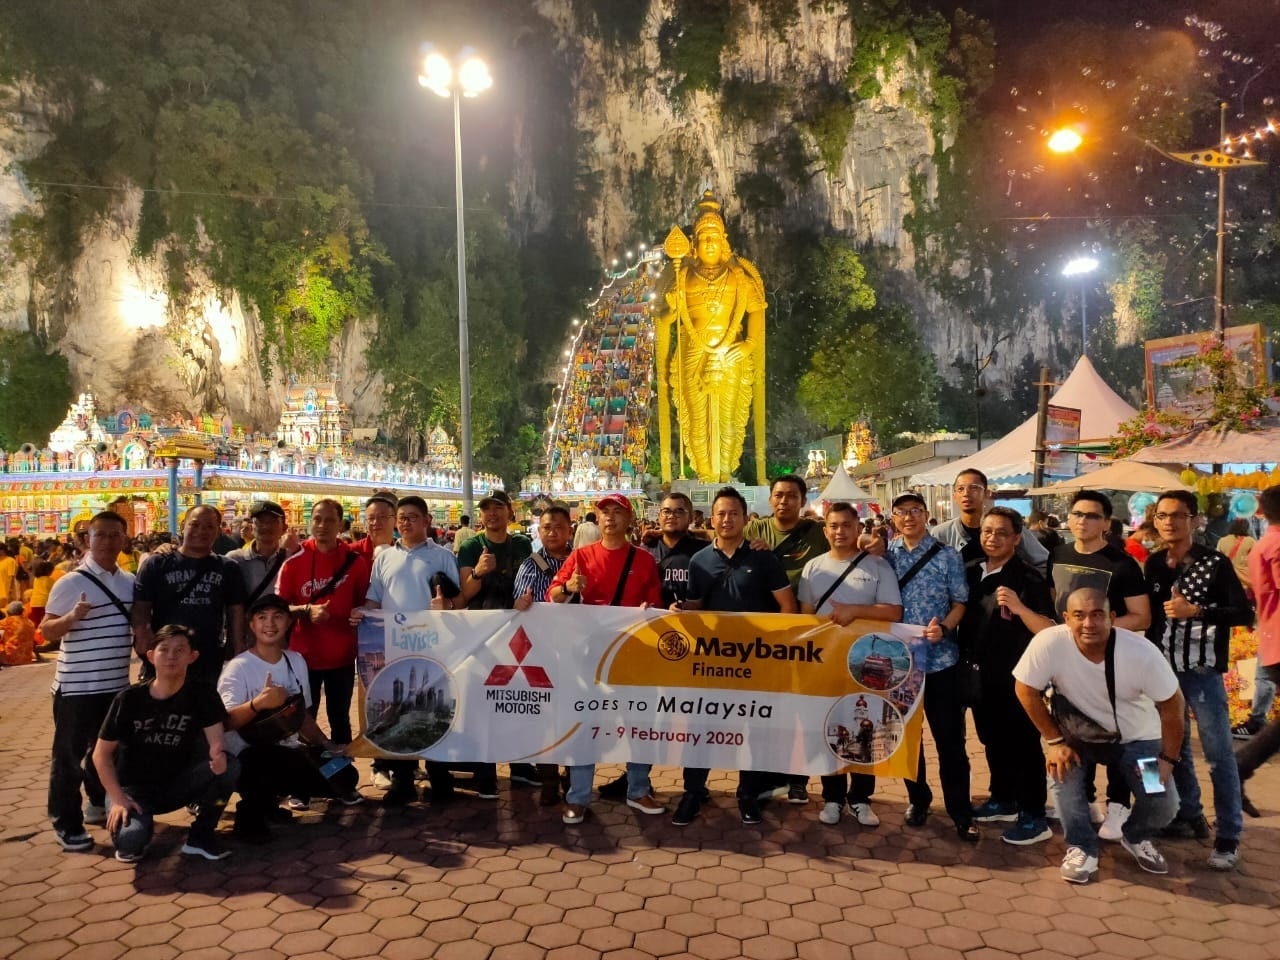 Malaysia 7-9 Feb 2020 3